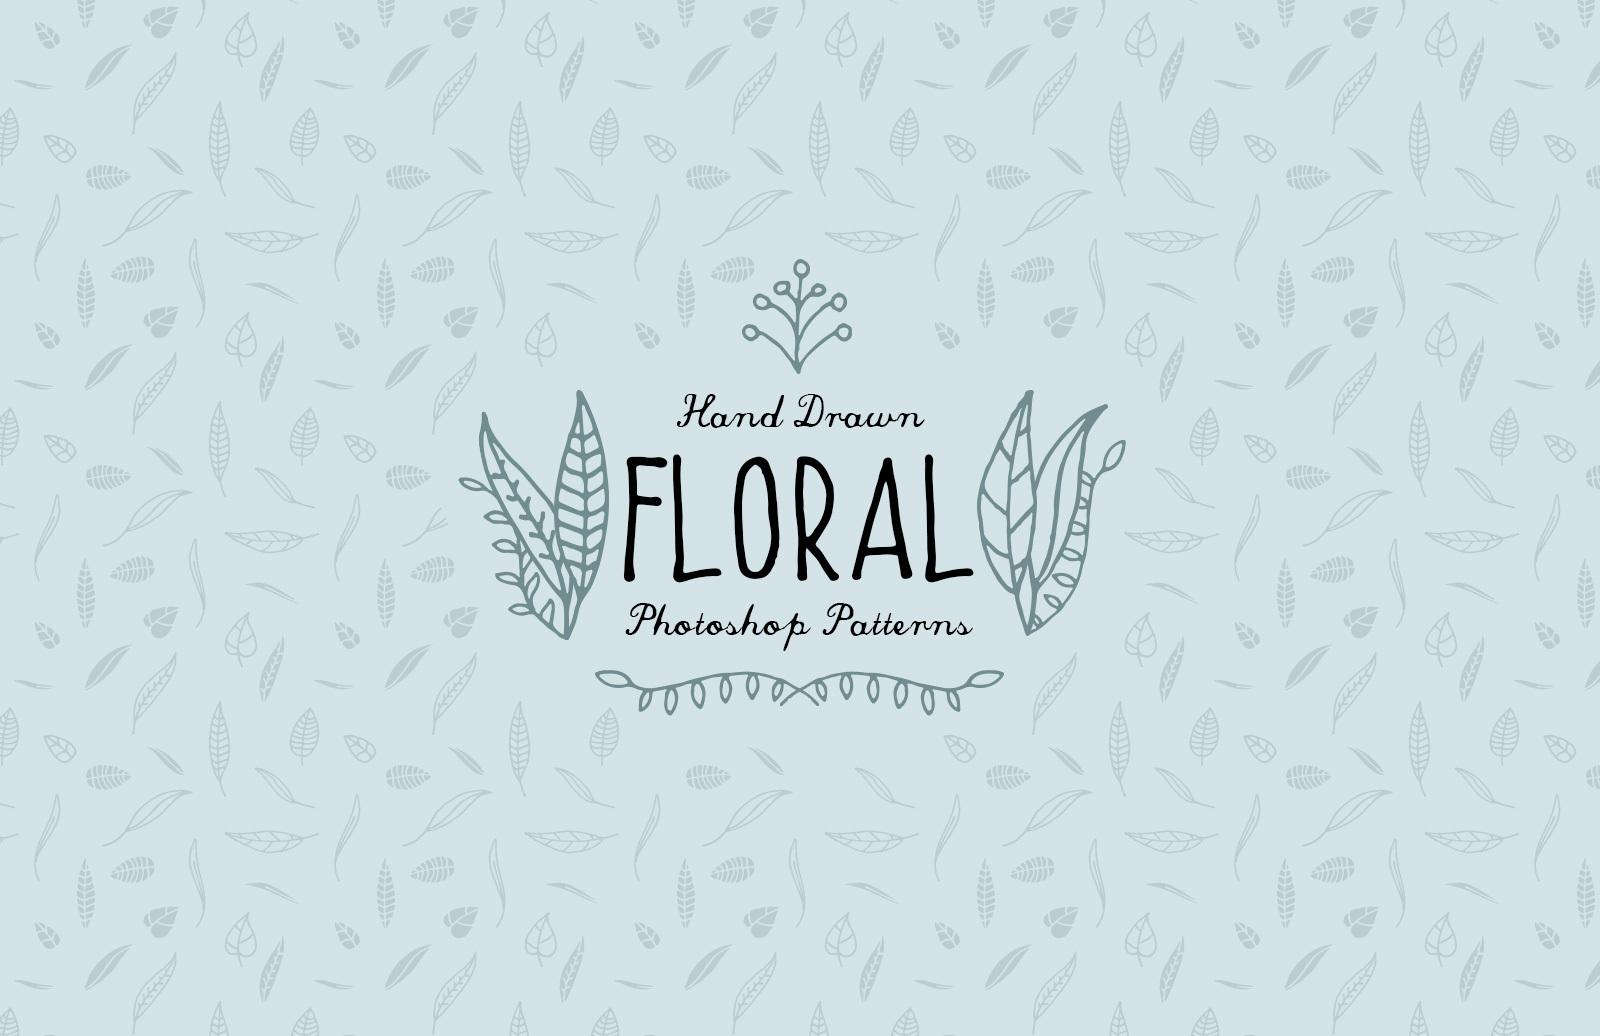 Hand Drawn Floral Photoshop Patterns